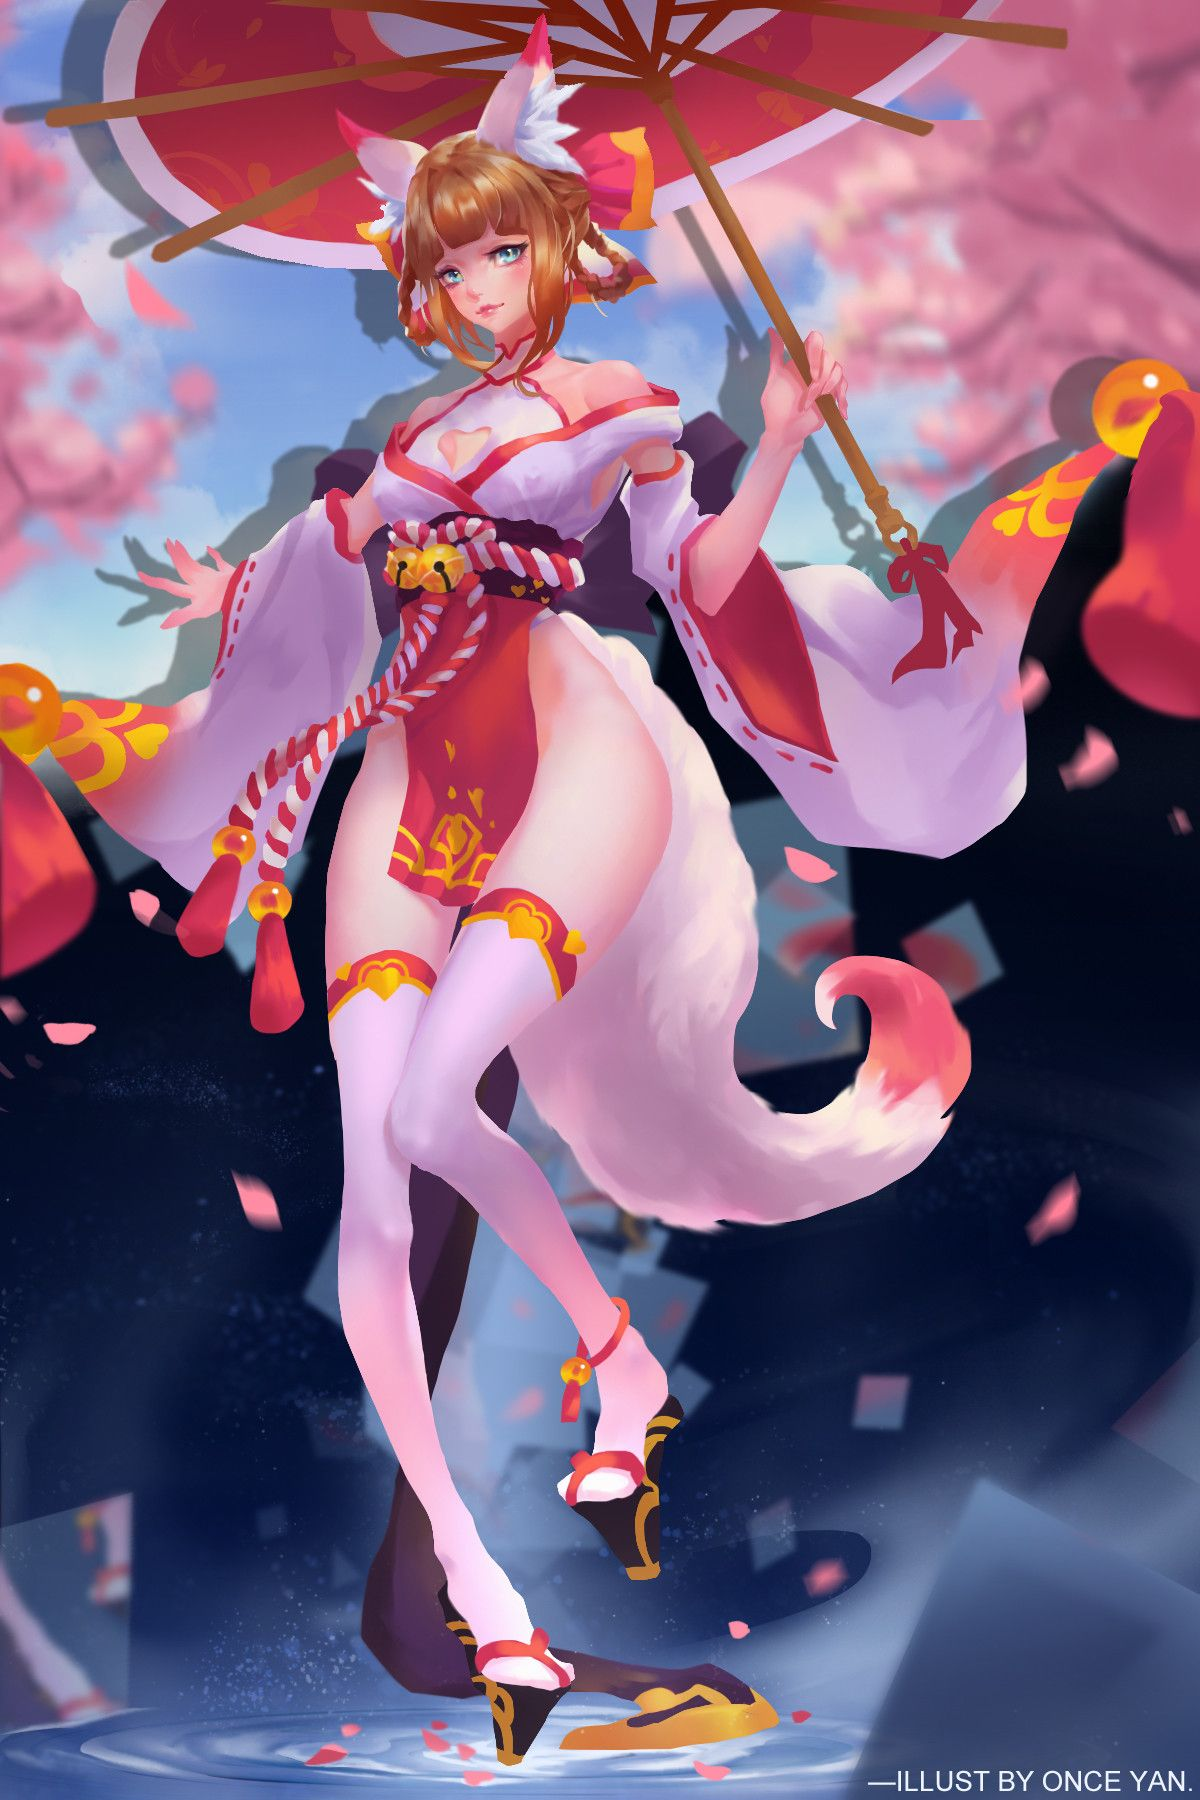 ArtStation 鏡中巫女, once yan Anime characters list